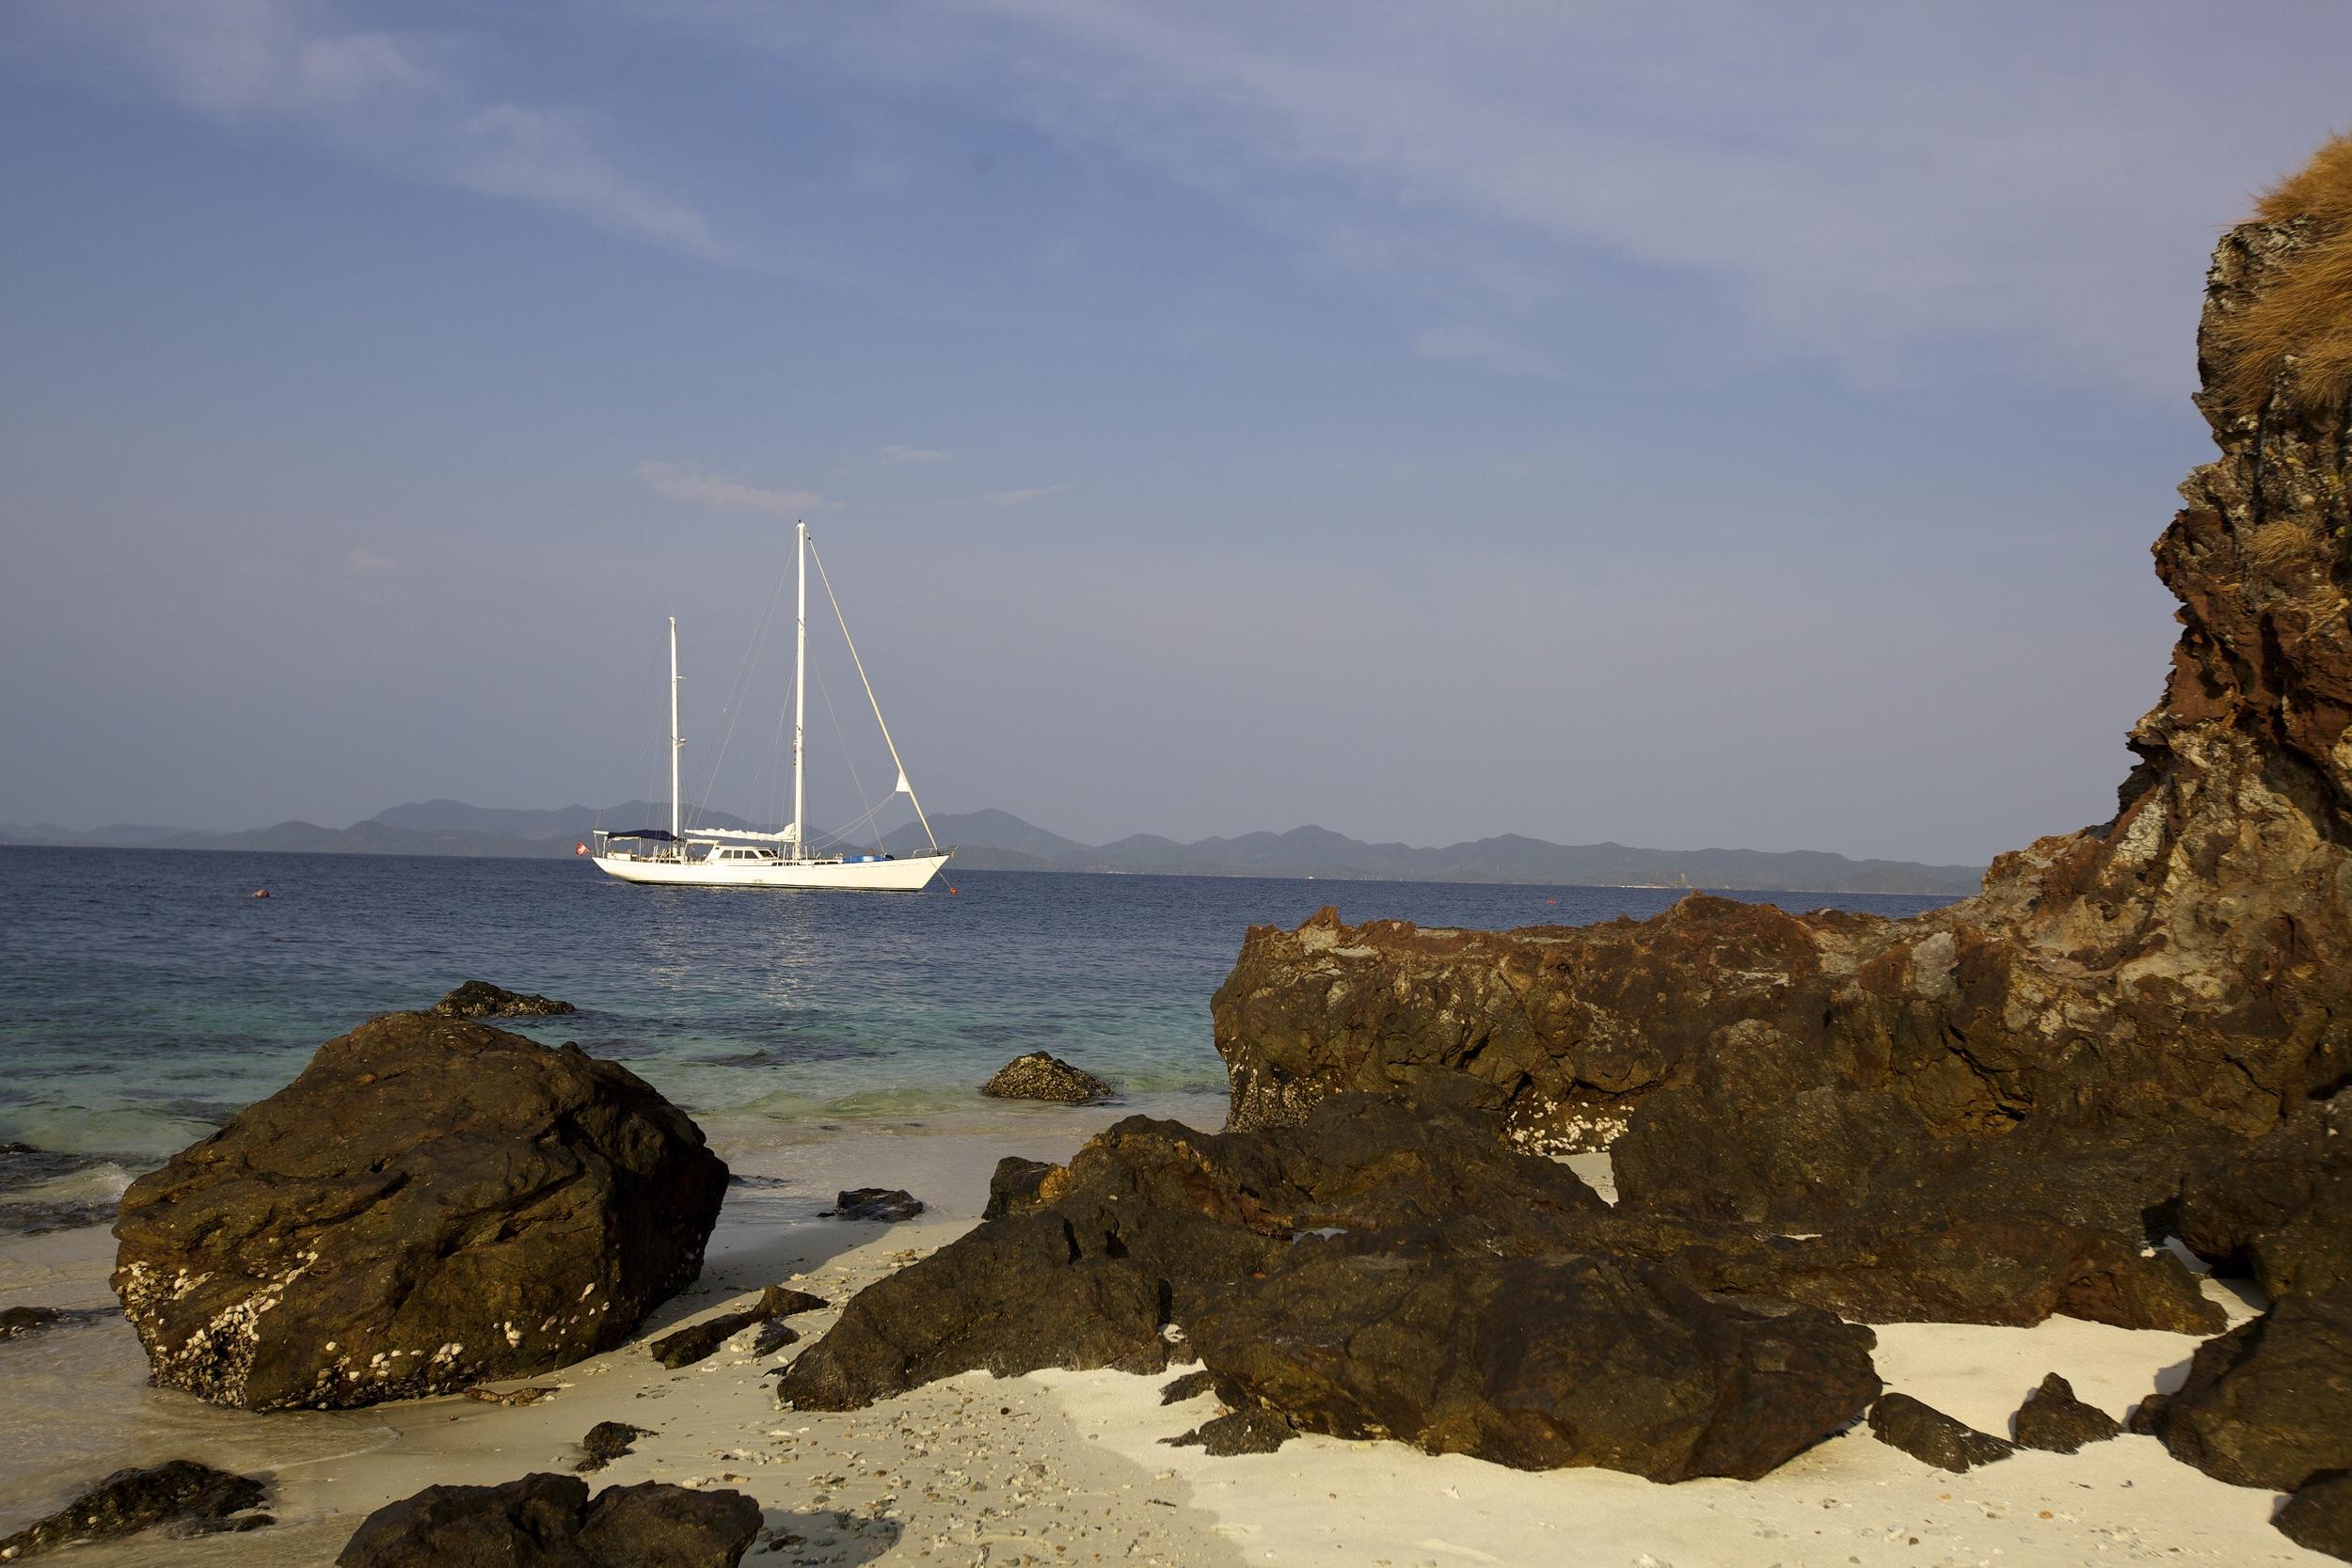 Meta IV anchoring at a rocky beach